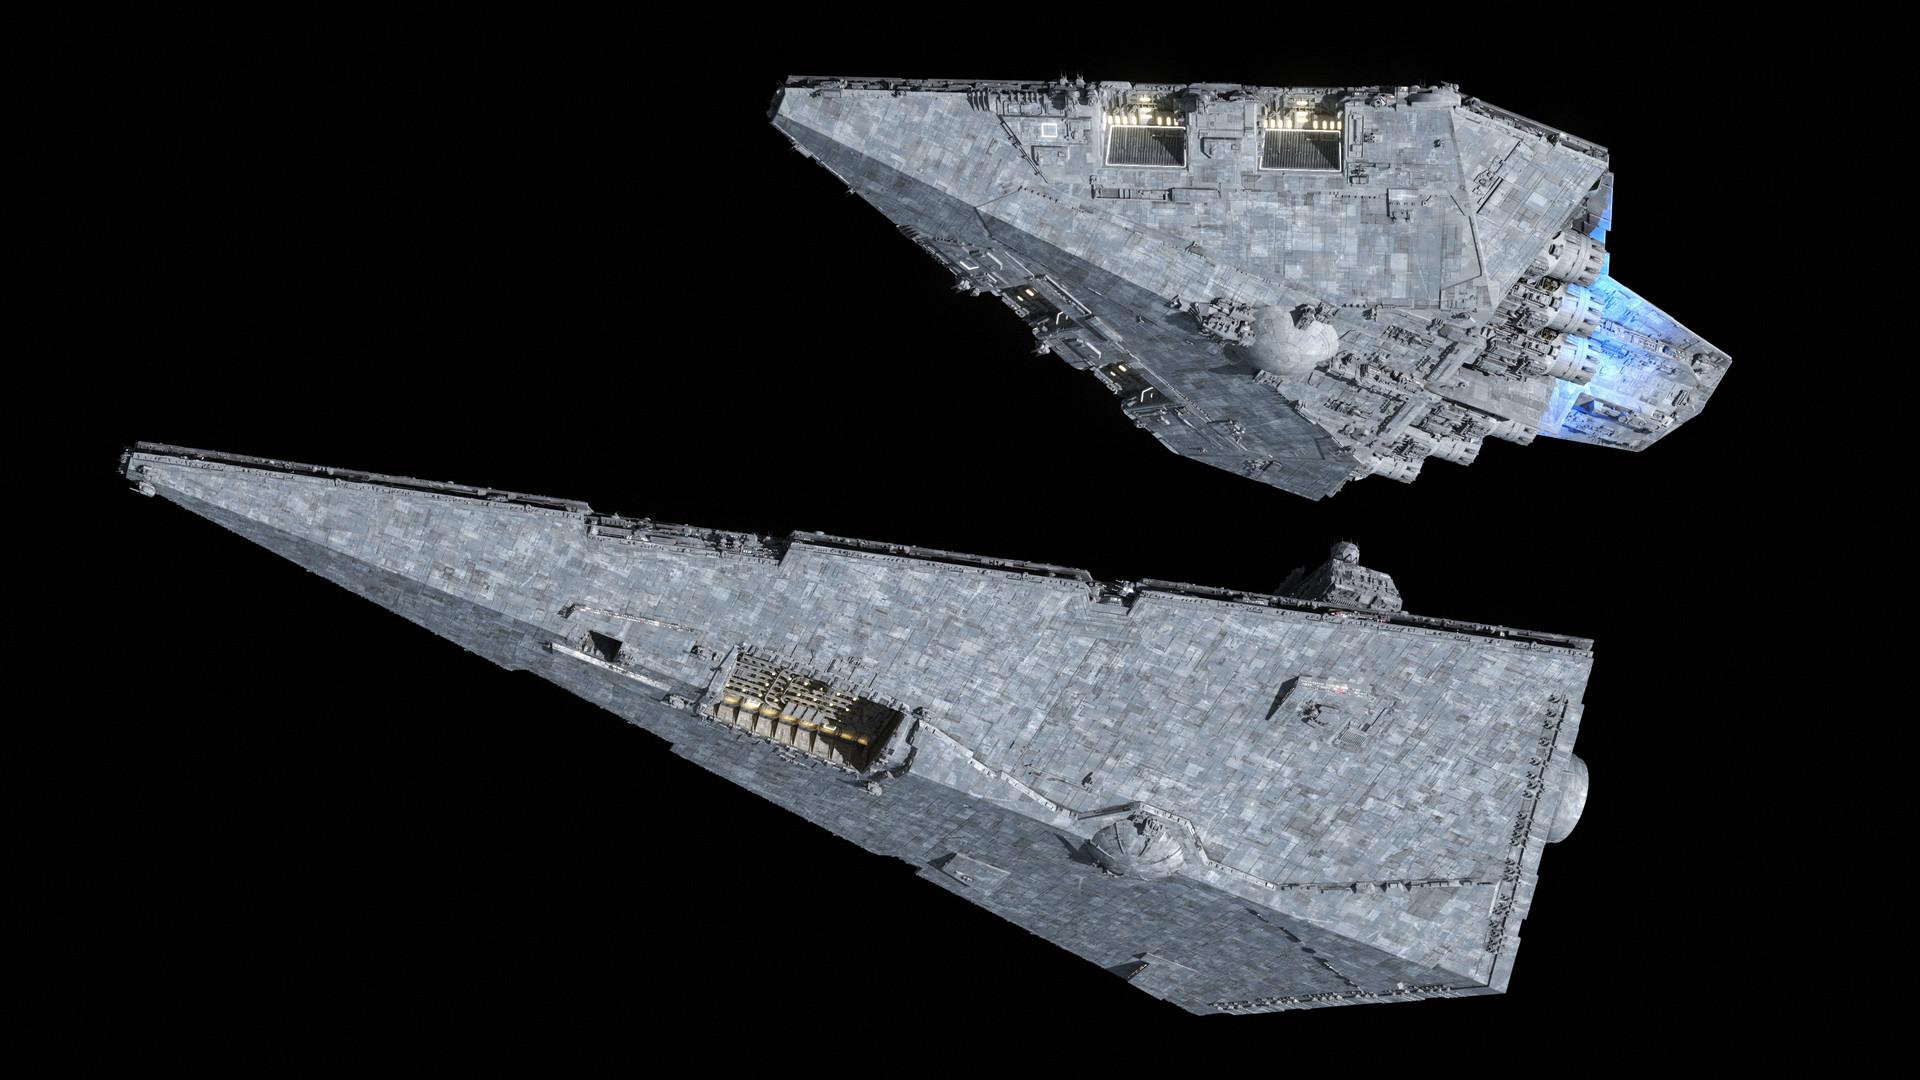 Ansel hsiao frigate62